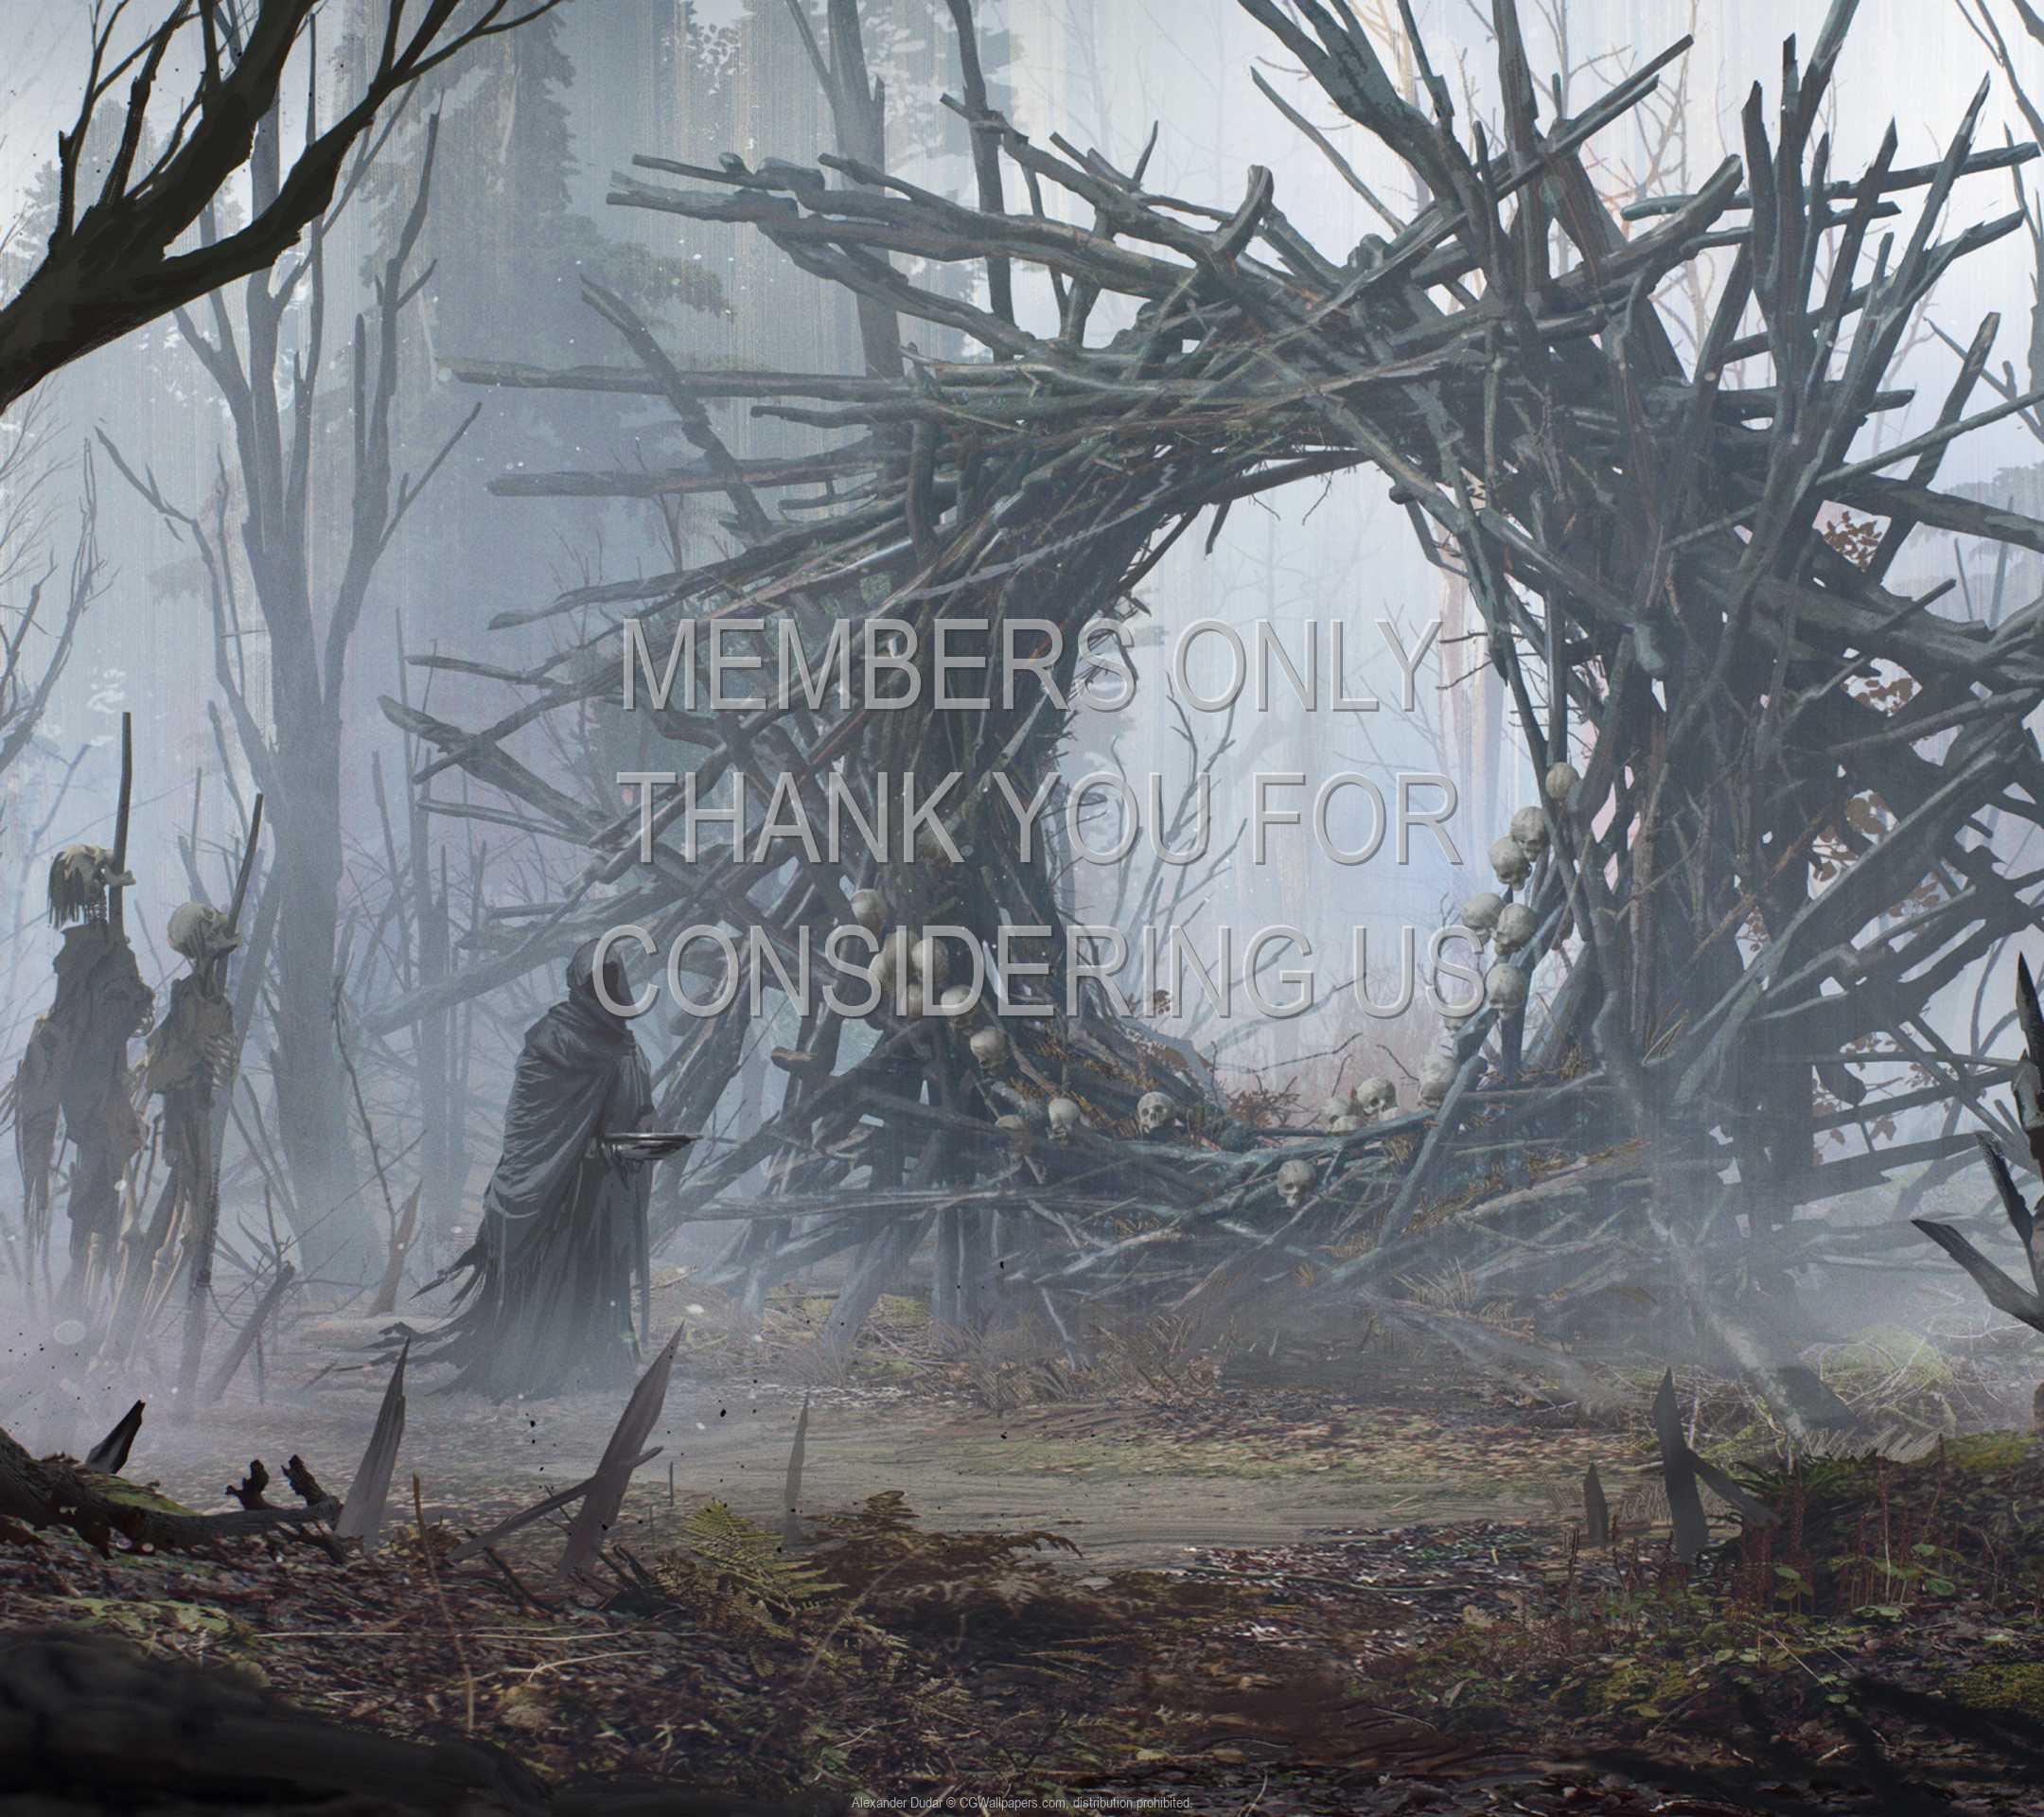 Alexander Dudar 1080p Horizontal Mobile fond d'écran 01